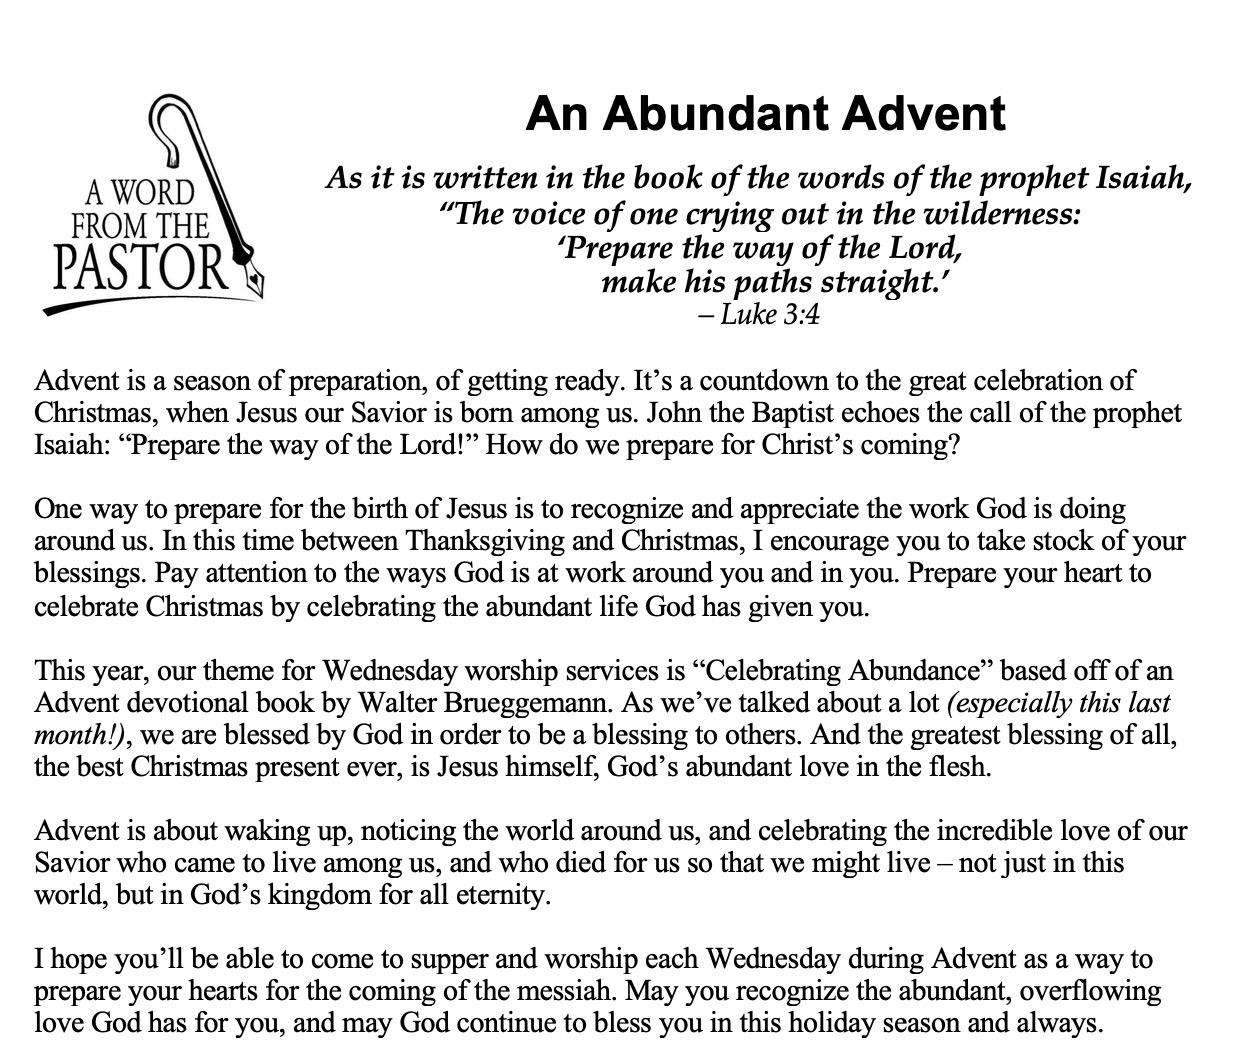 An Abundant Advent - Newsletter - Daniel Flucke